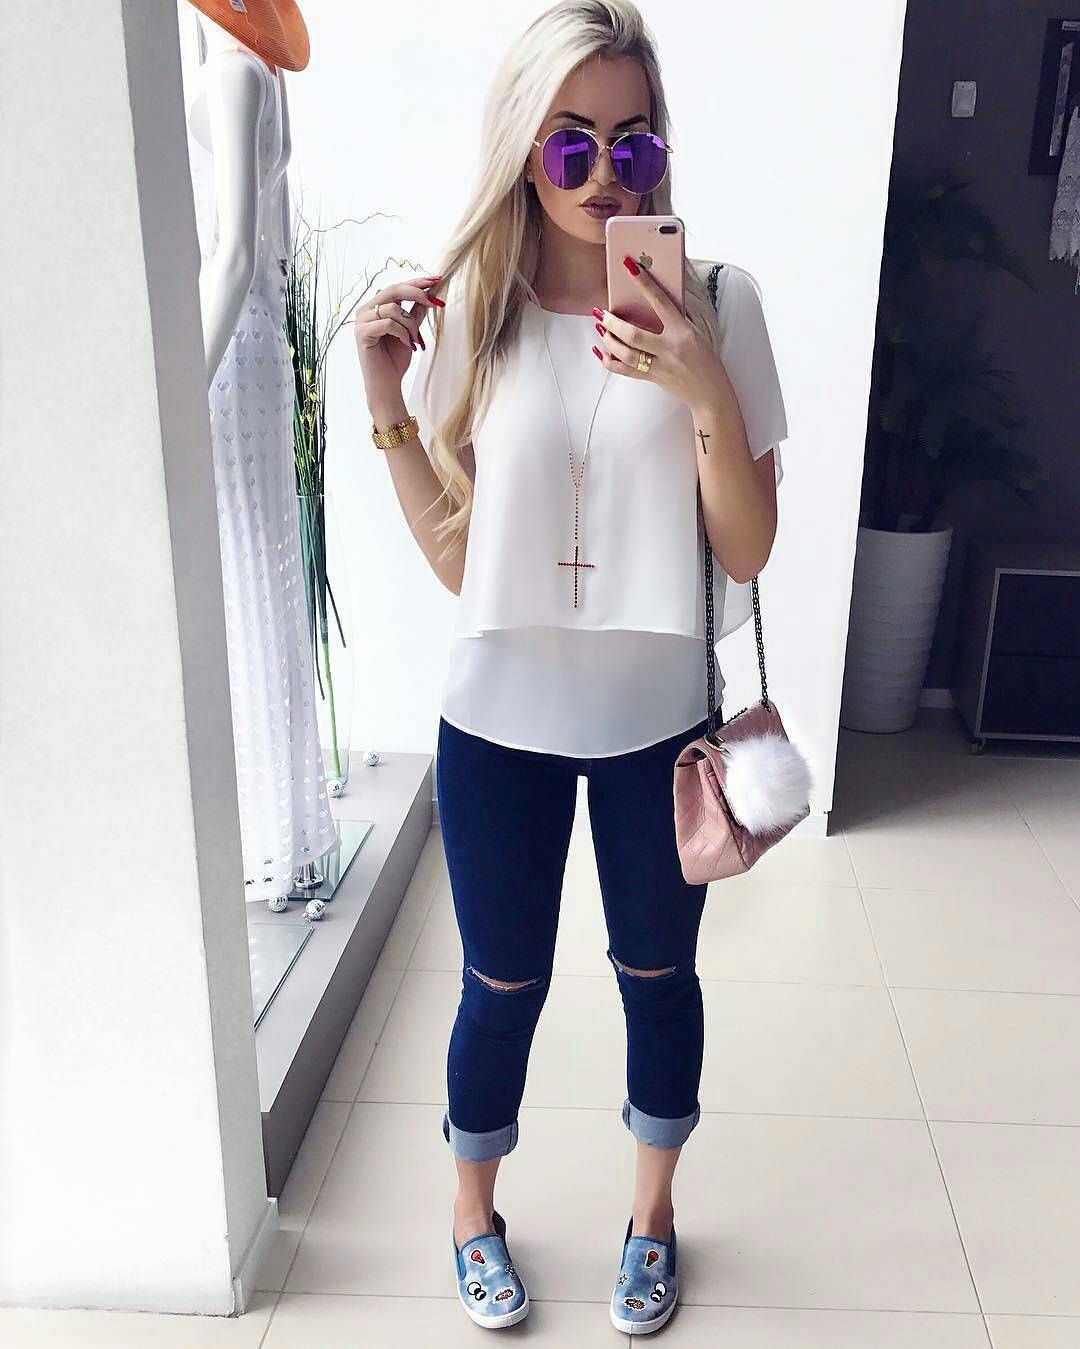 Moda Tumblr Girls ( modatumblrgirls) • Fotos y vídeos de Instagram ... c4481e8b9f51e